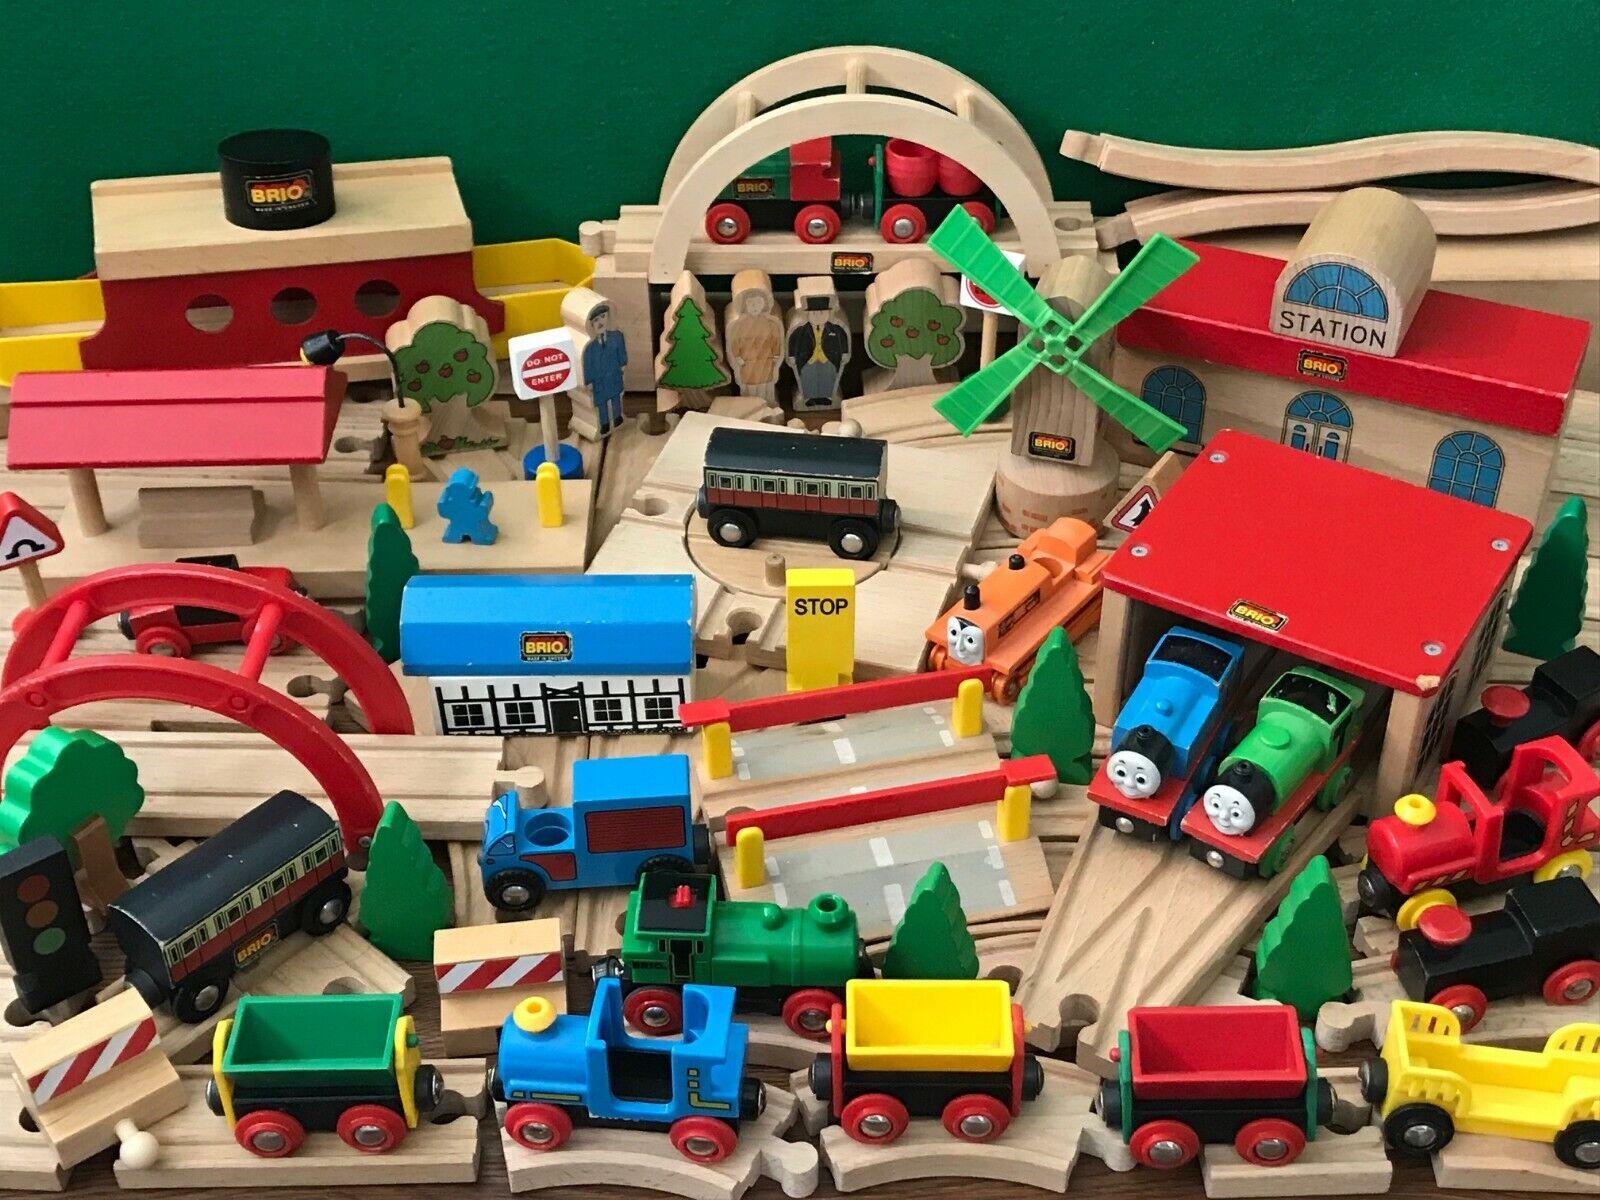 GENUINE BRIO TRAIN SET bundle lot for THOMAS & FRIENDS WOODEN RAILWAY ENGINE SET